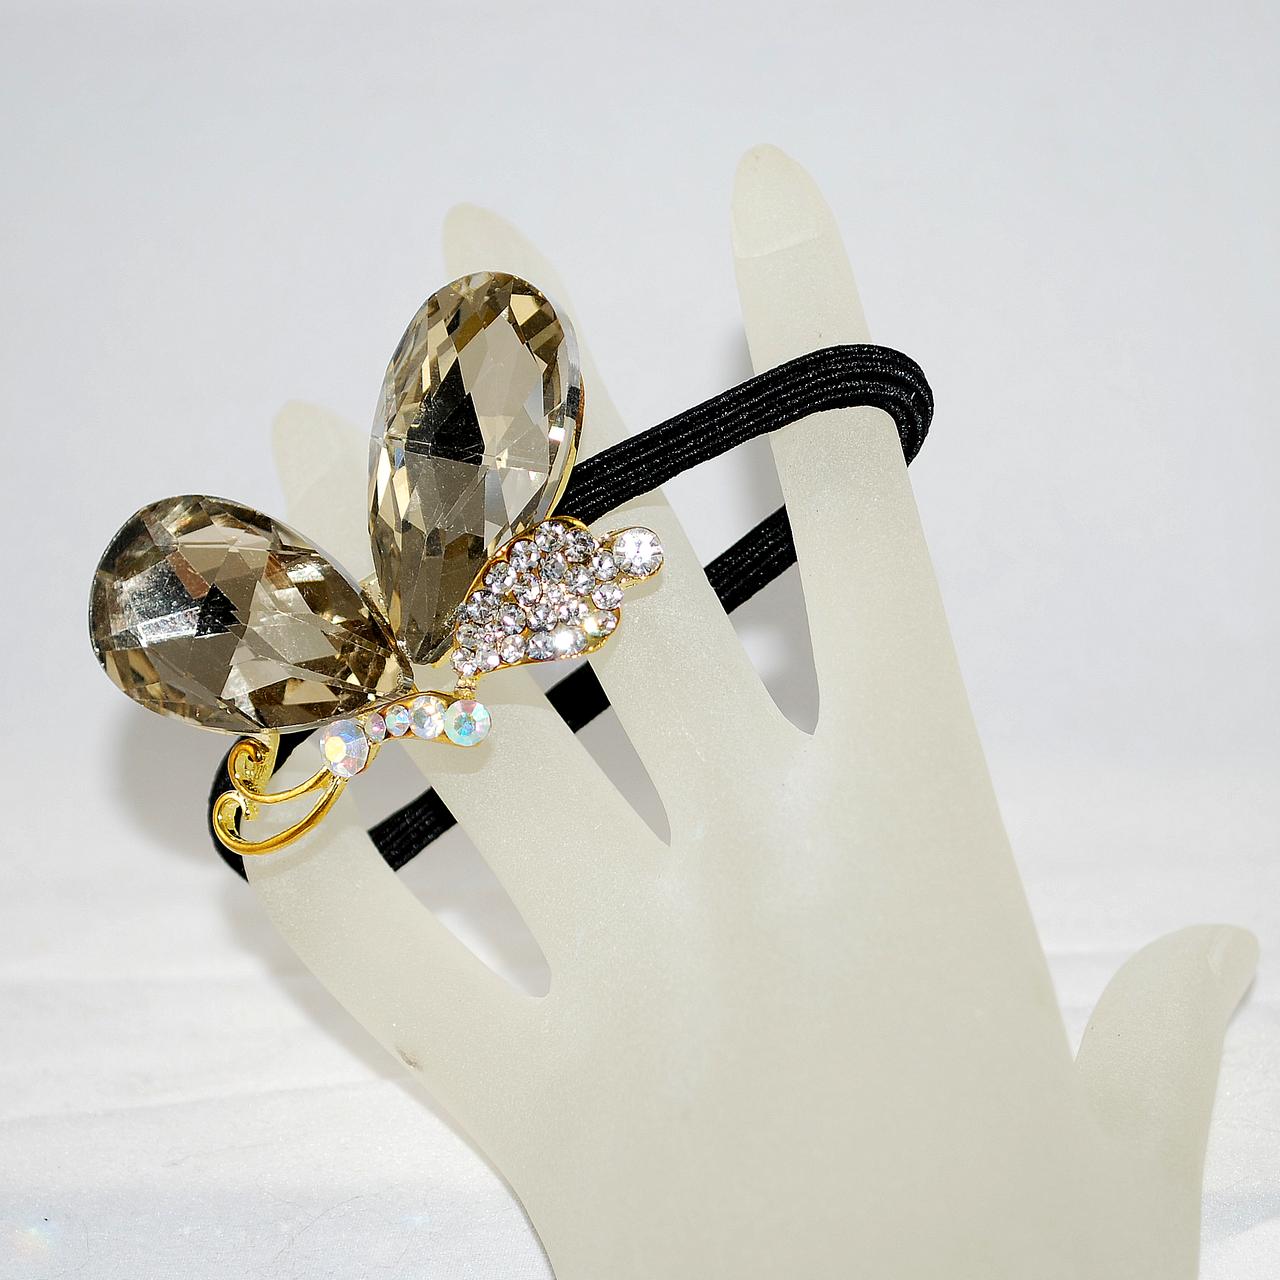 Enchanting Jewelry Creations image 17